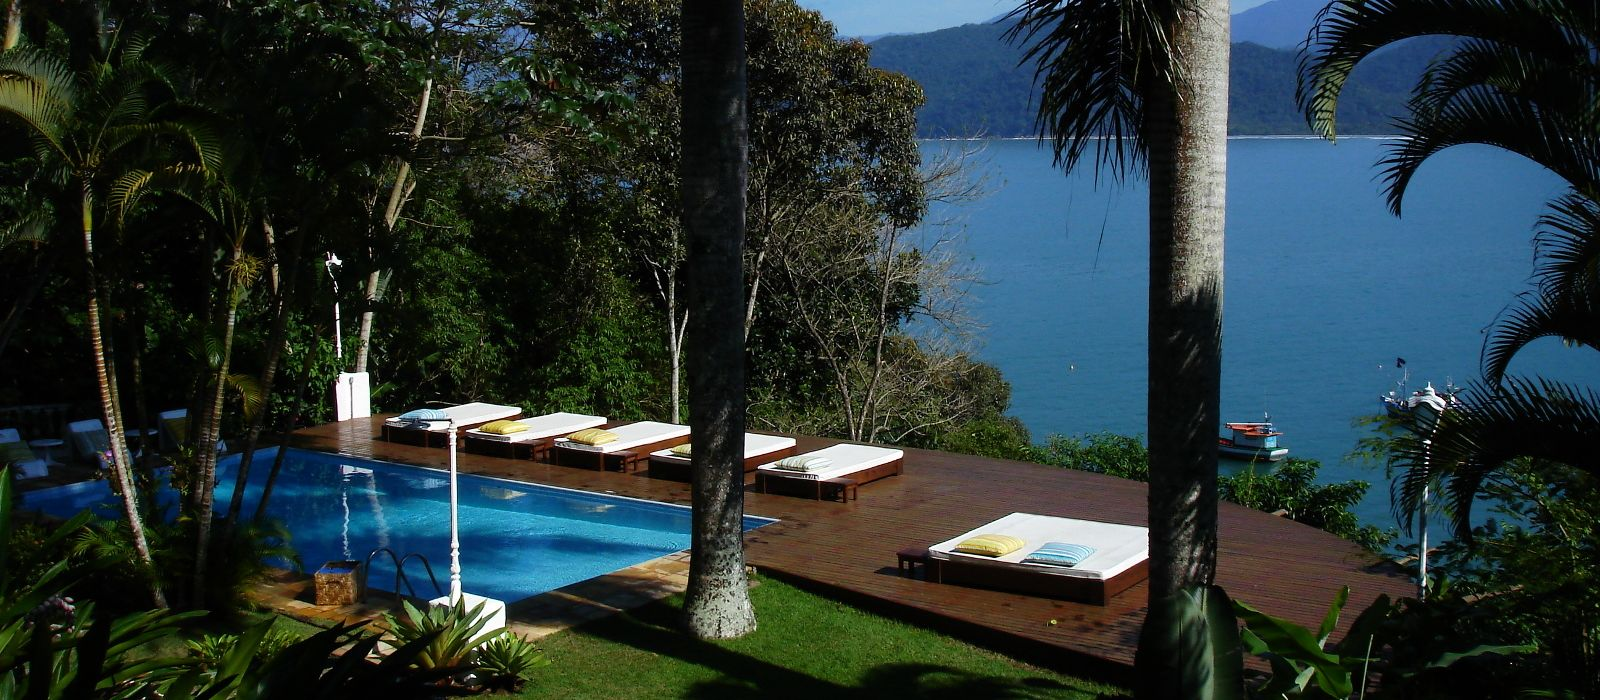 Hotel Pousada Picinguaba Brazil